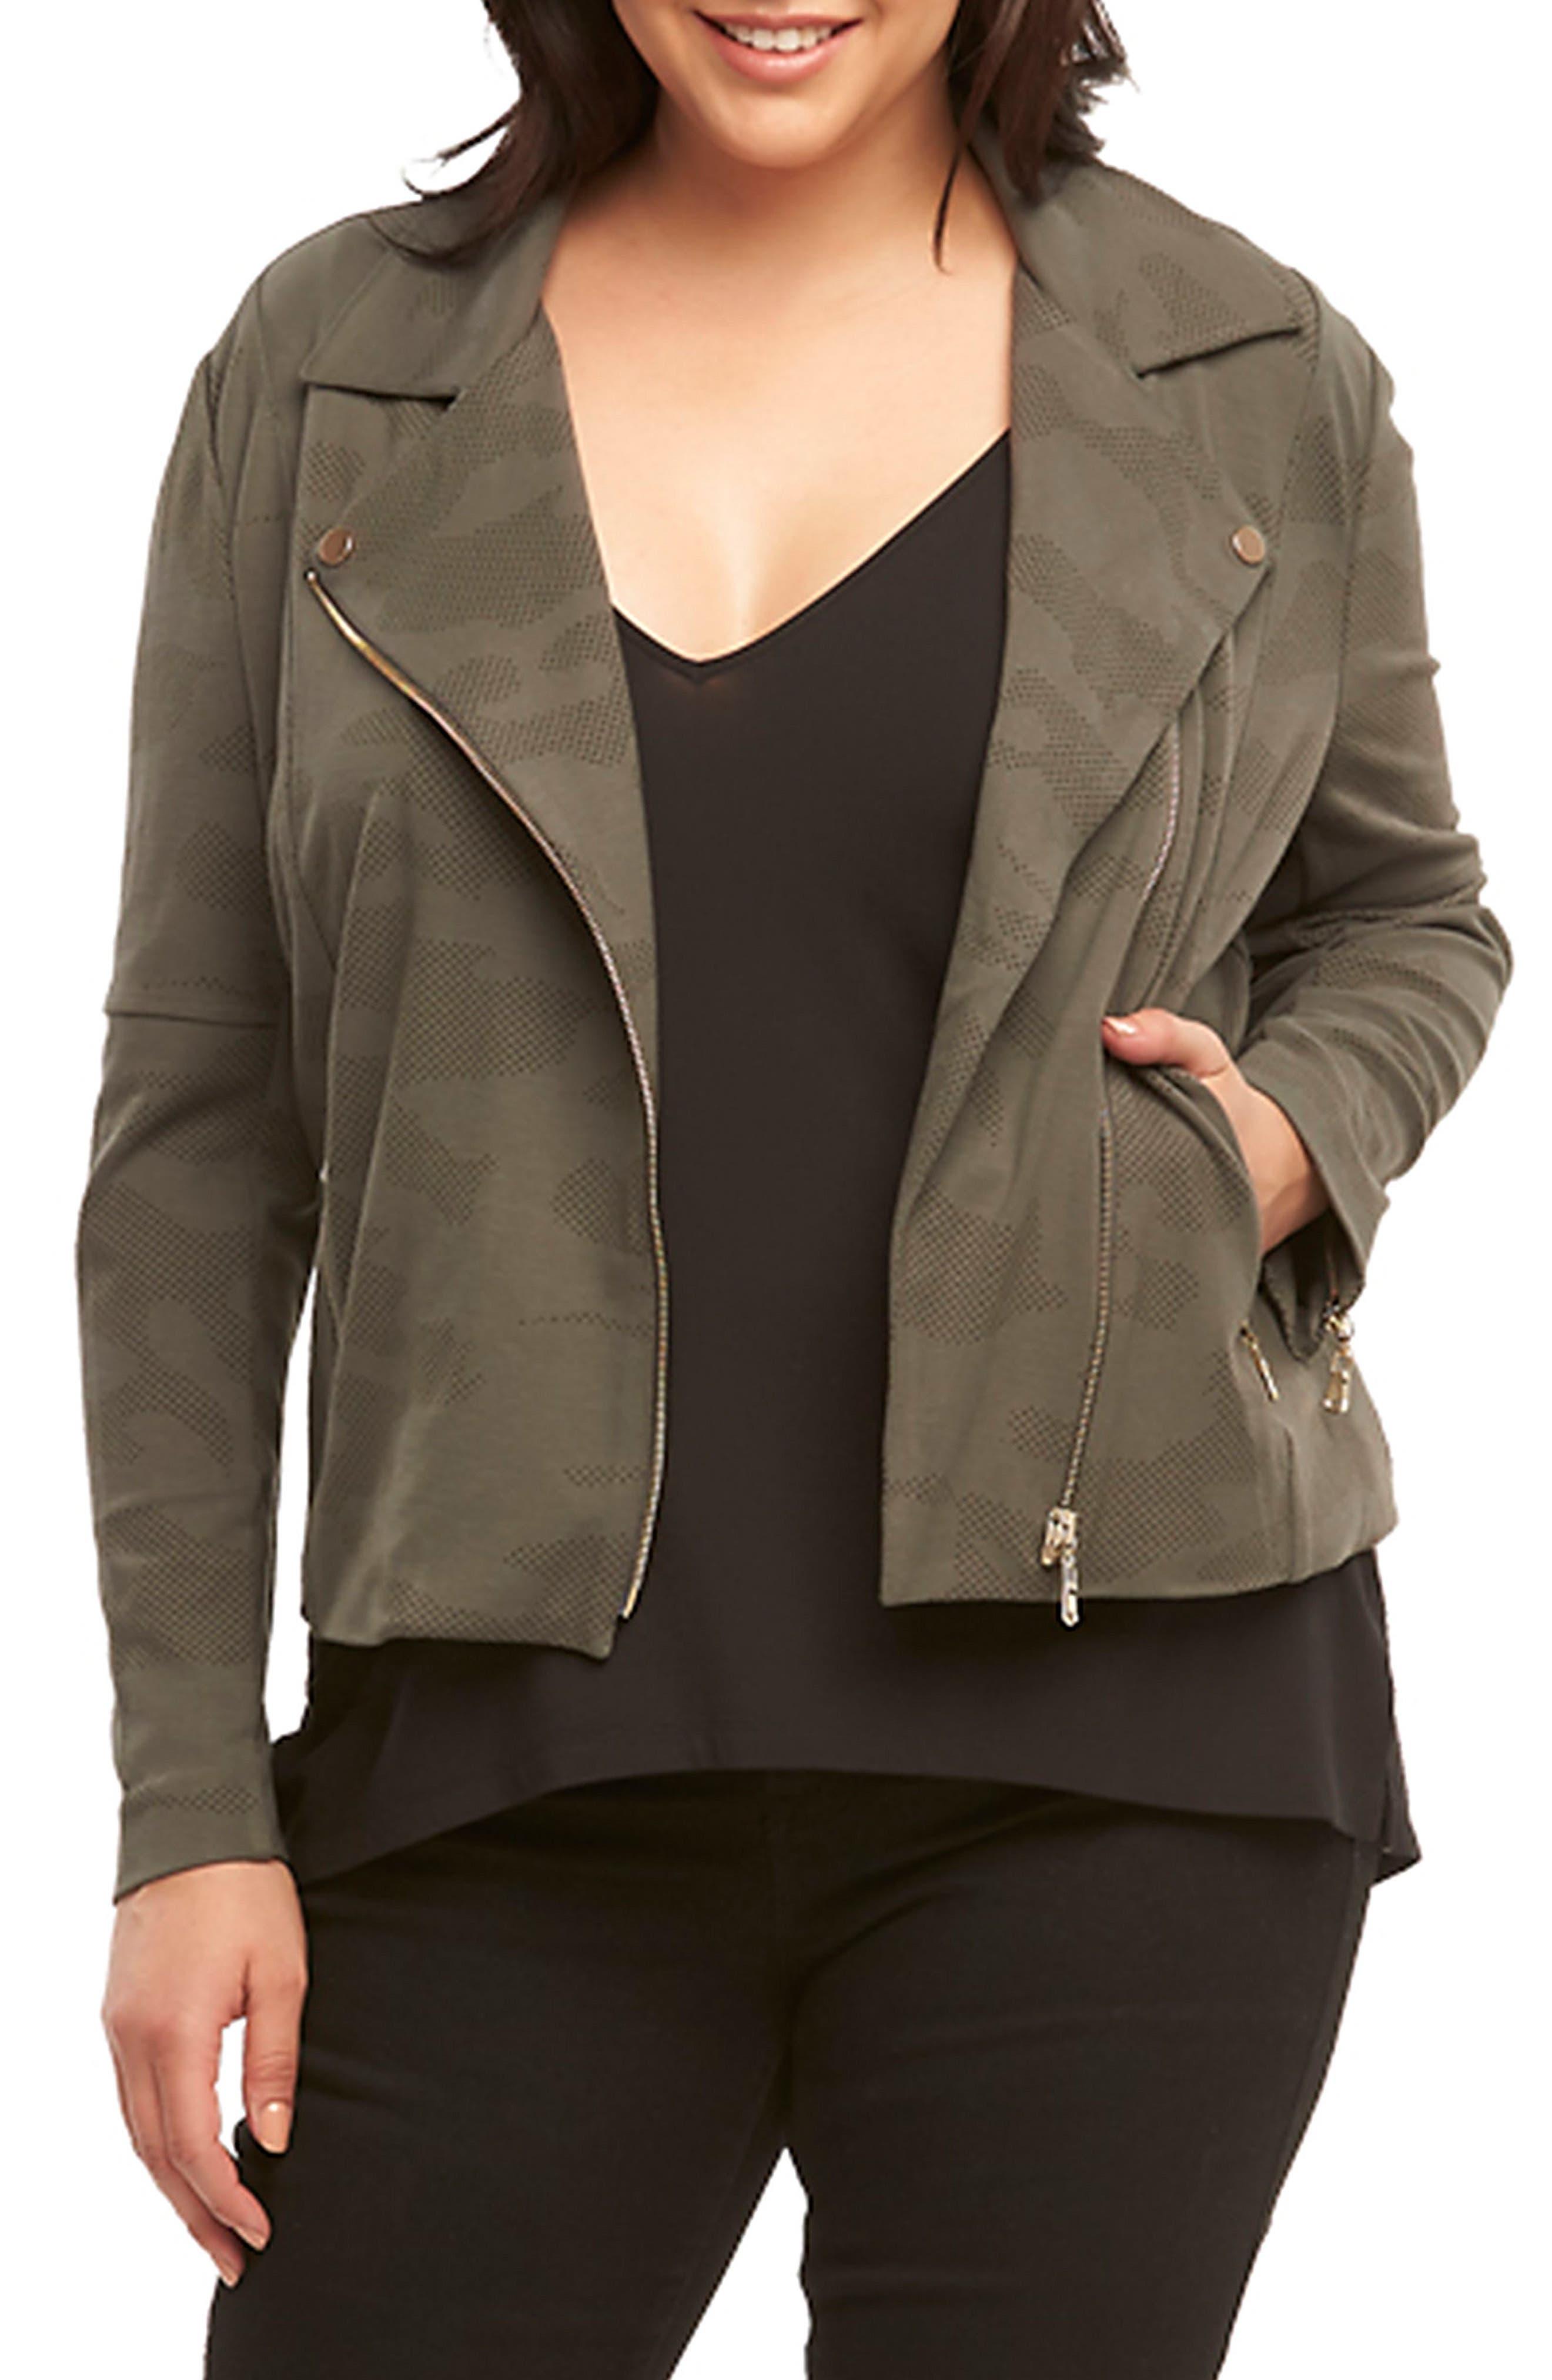 Gracia Jacket,                         Main,                         color, 310